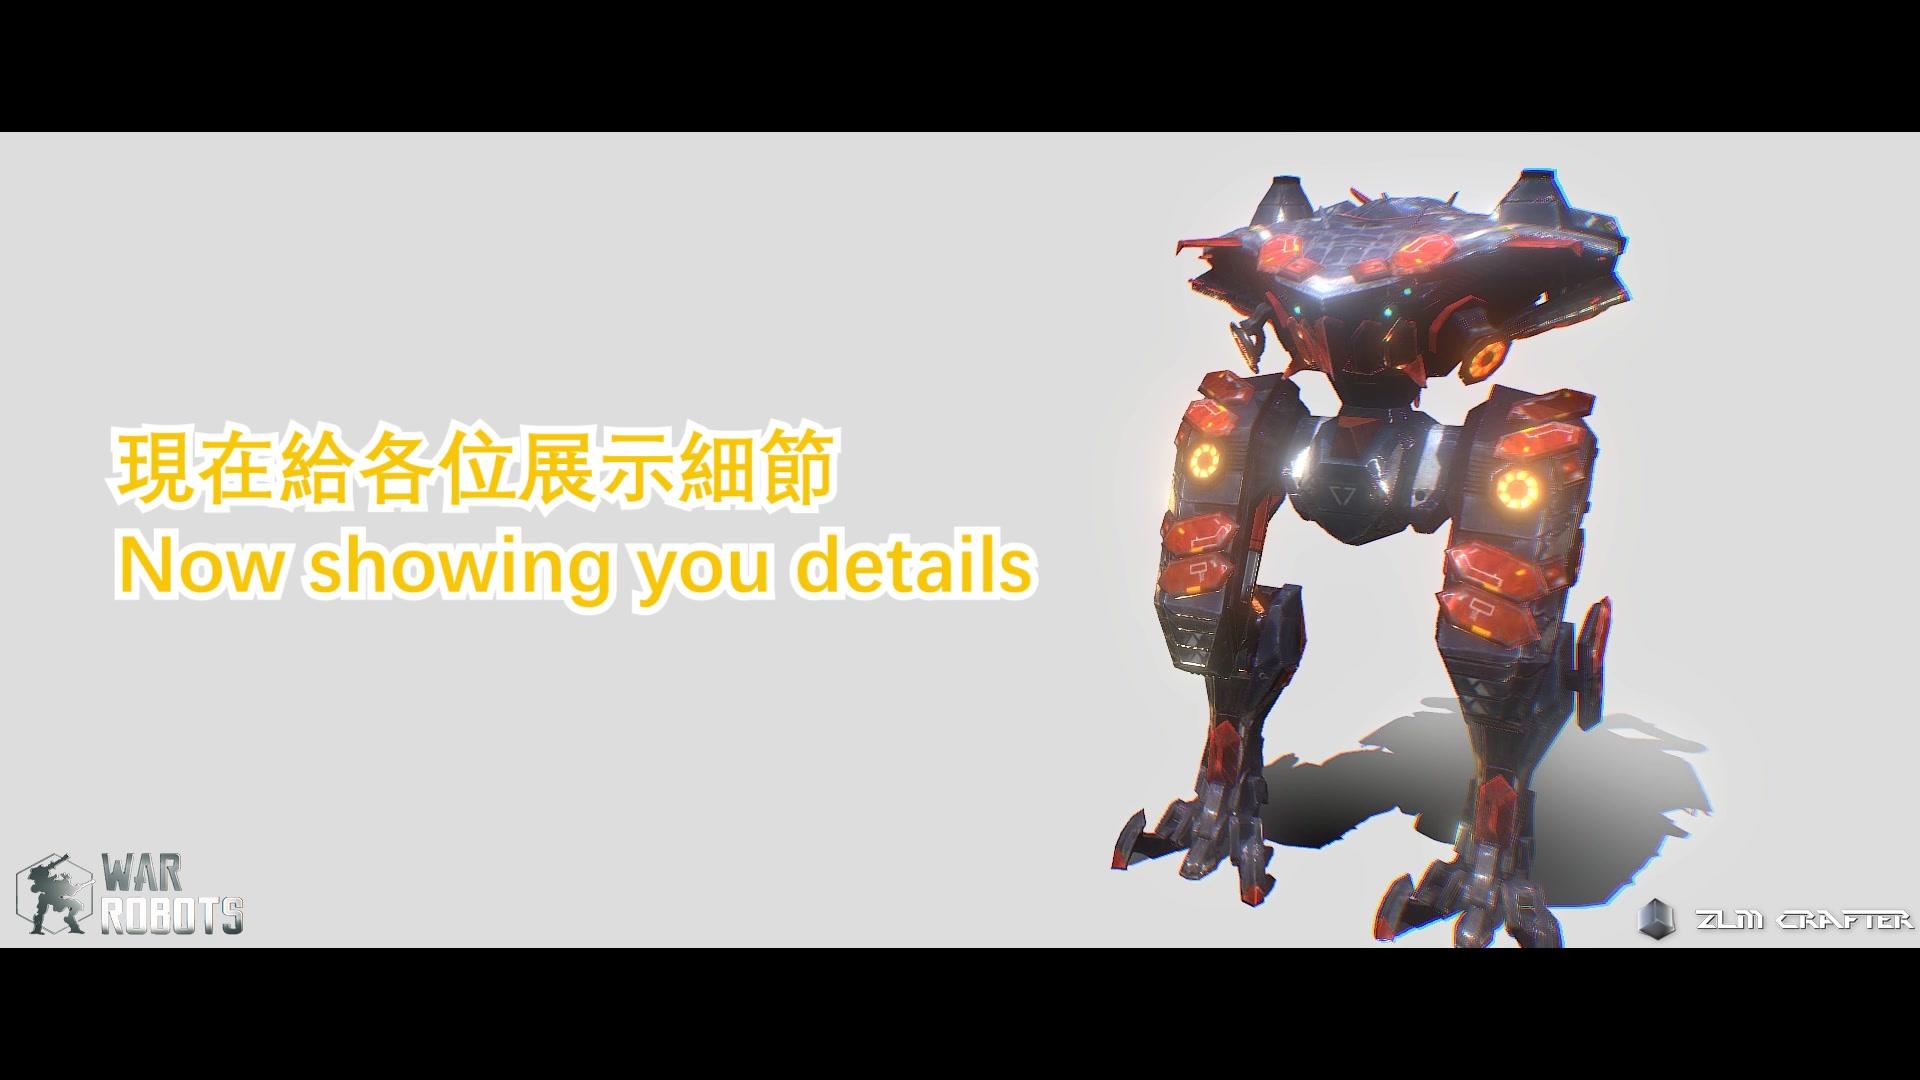 【War Robots】黑色星期五 - 模型永久免费下载